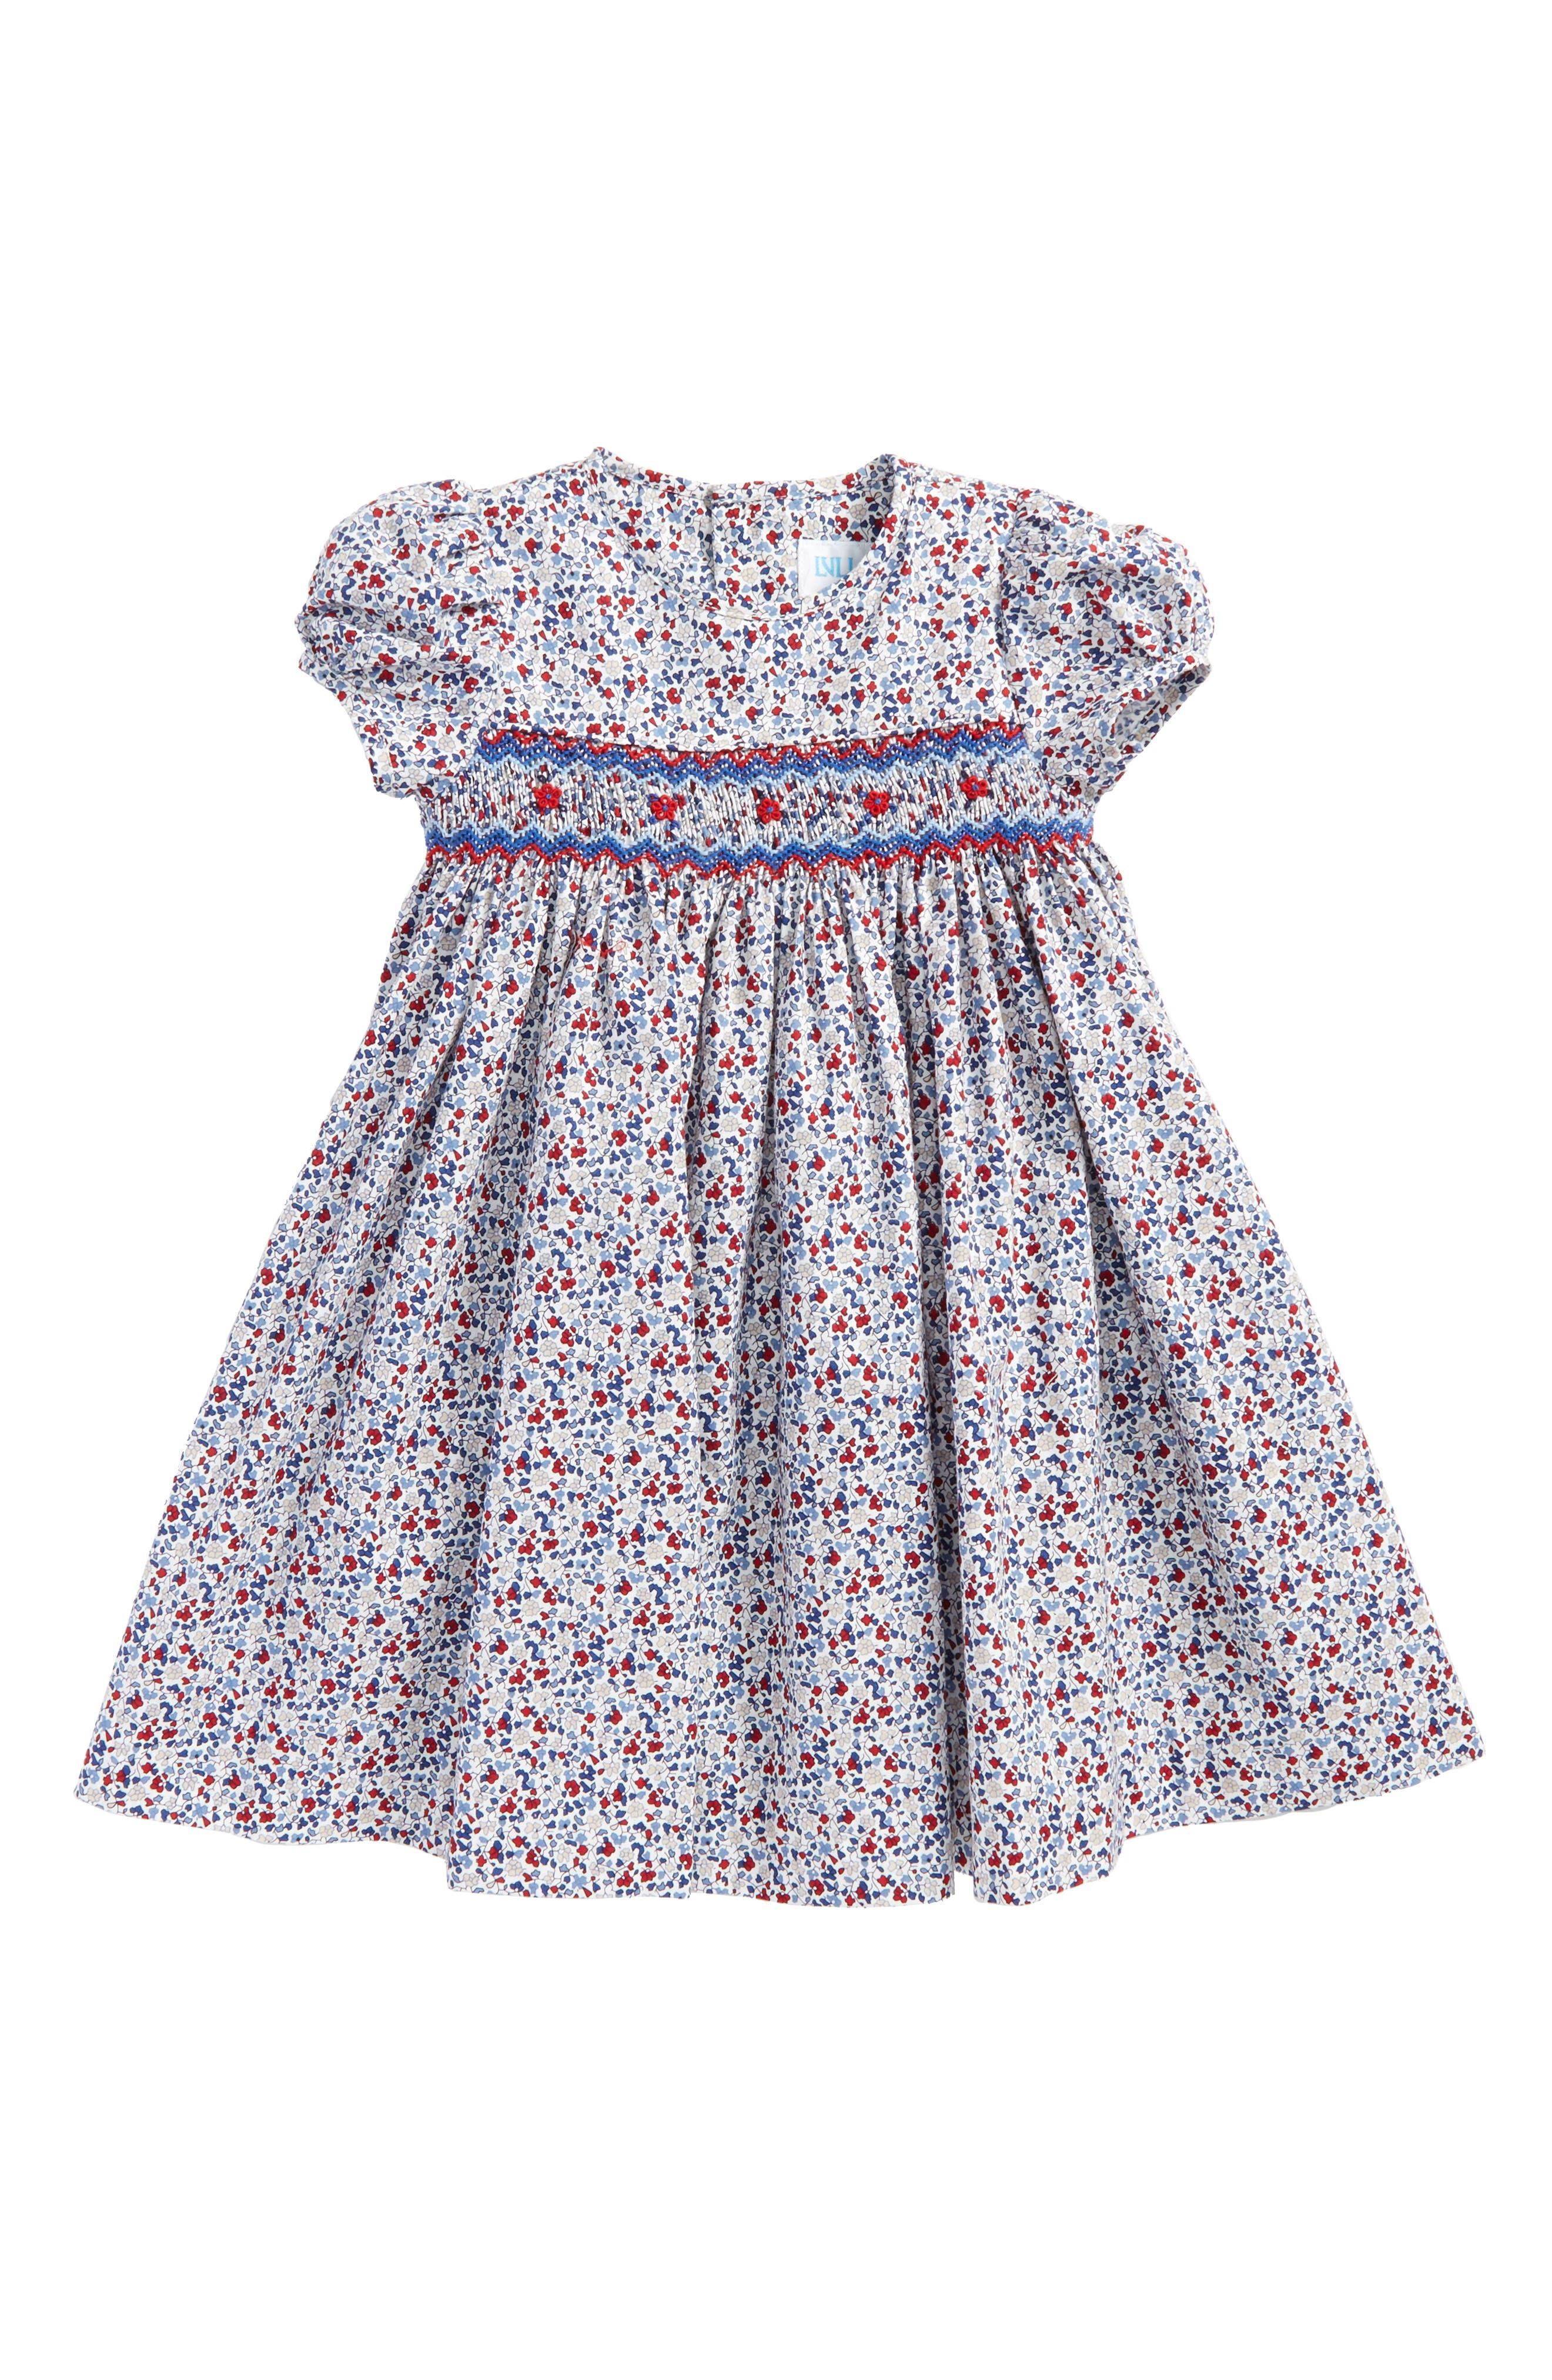 Floral Smocked Dress,                             Main thumbnail 1, color,                             600